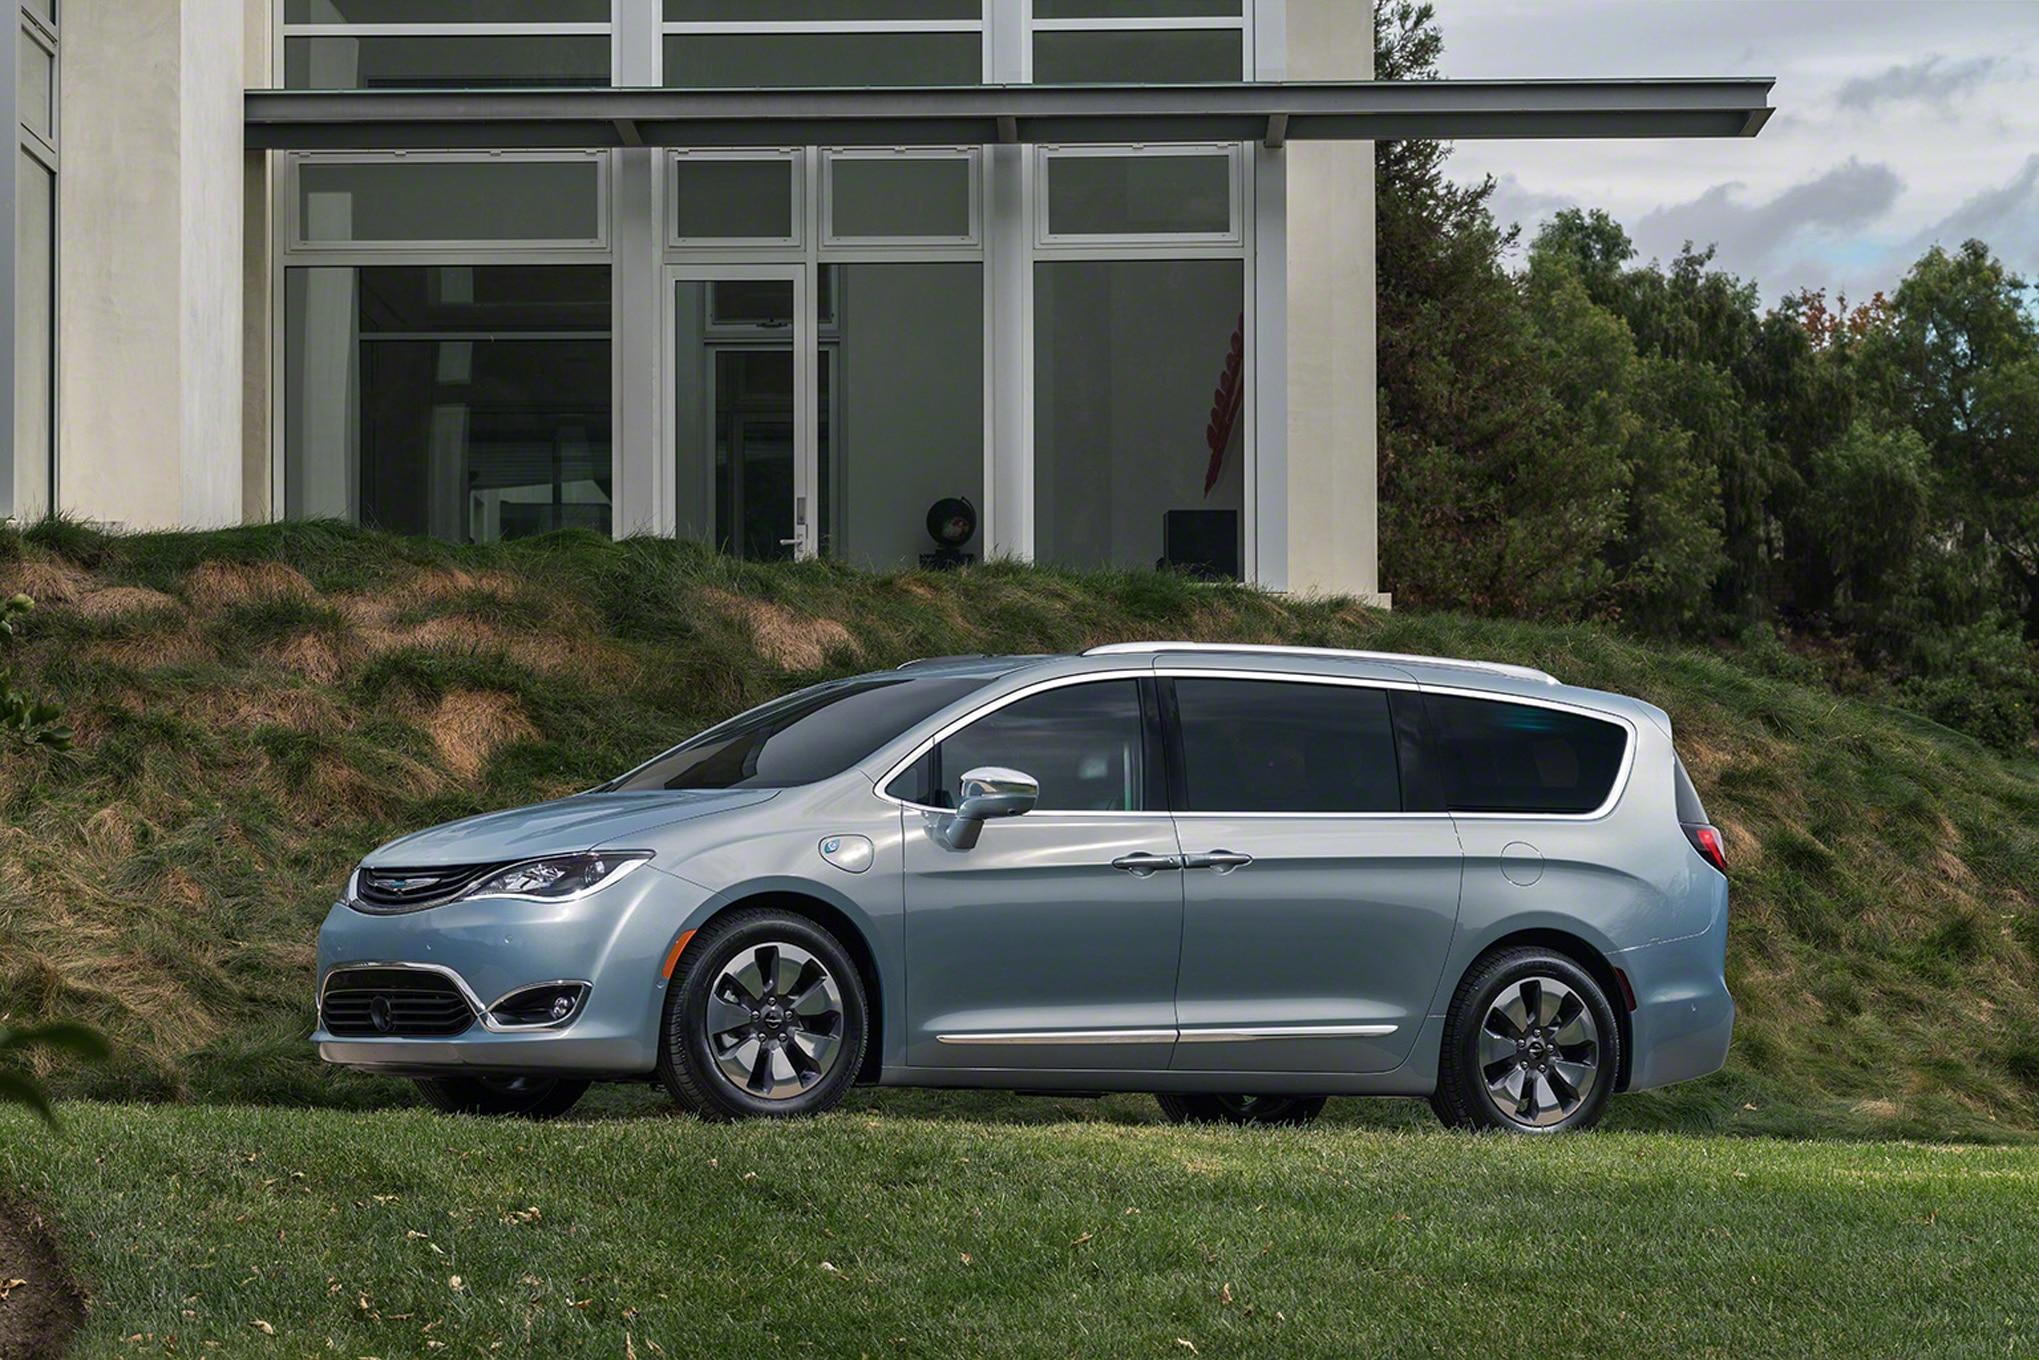 2017 Chrysler Pacifica Hybrid Front Three Quarter 03